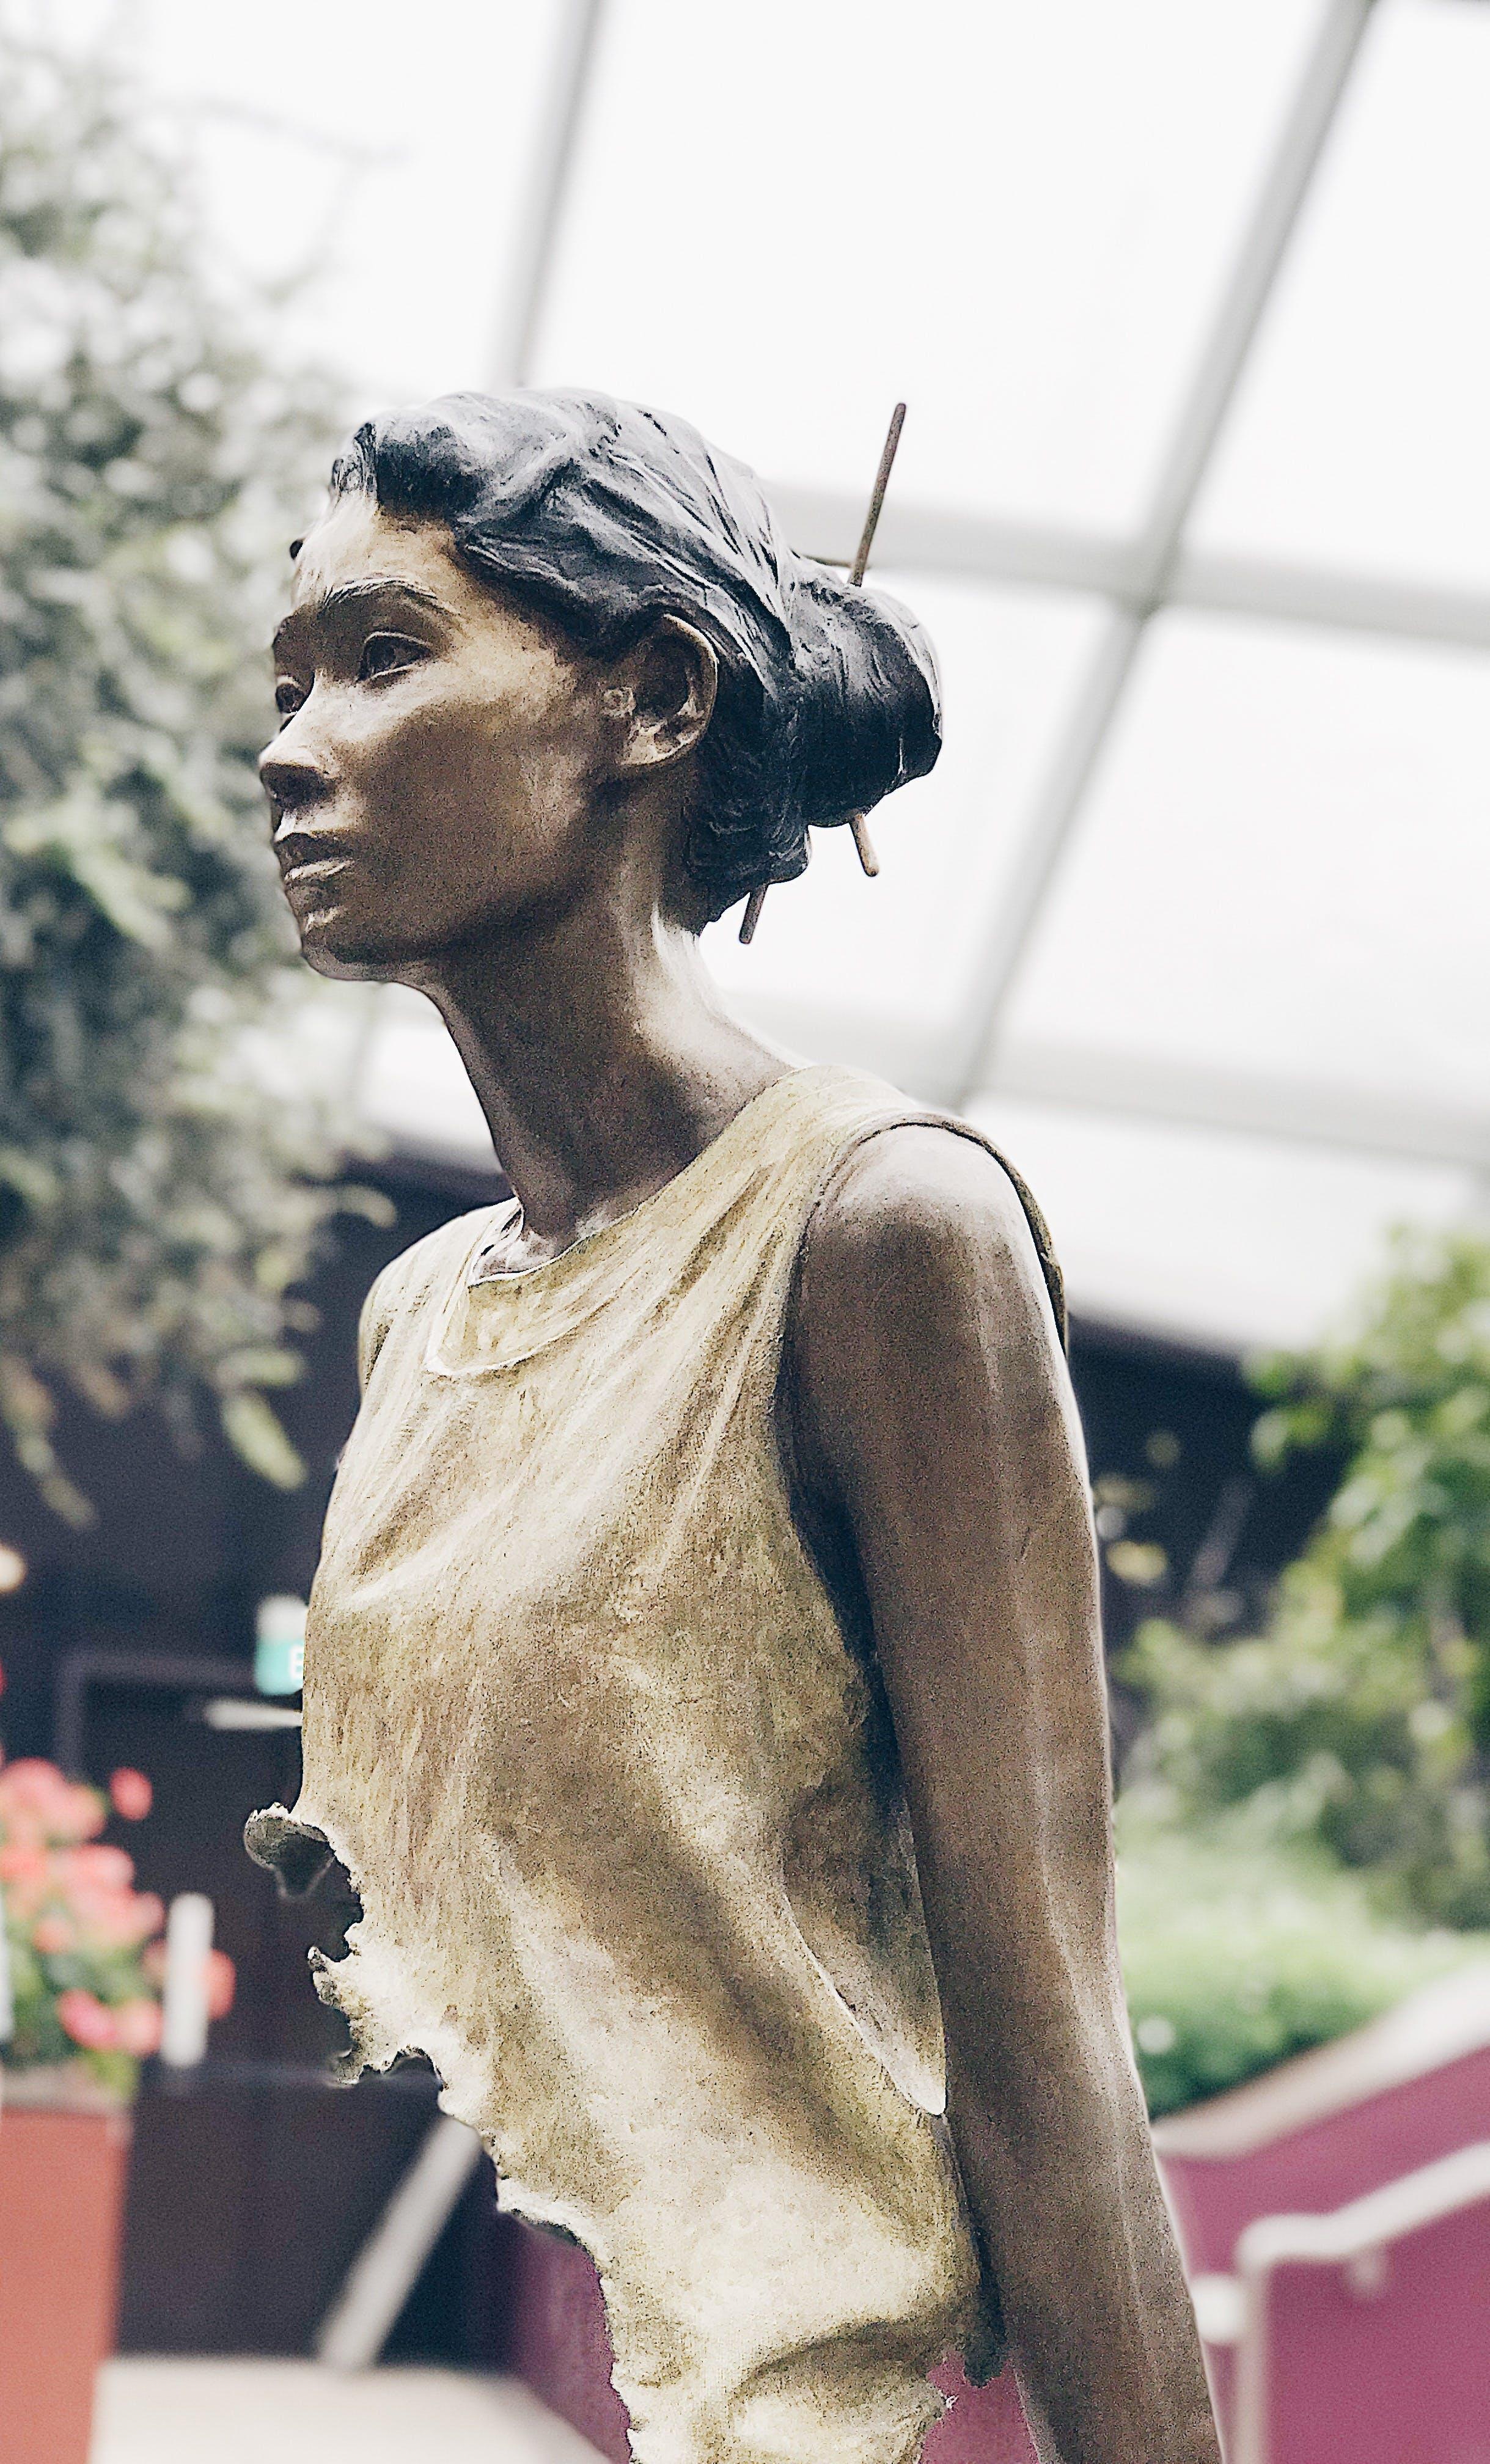 Free stock photo of Asian, bust, sculpture, sculptures